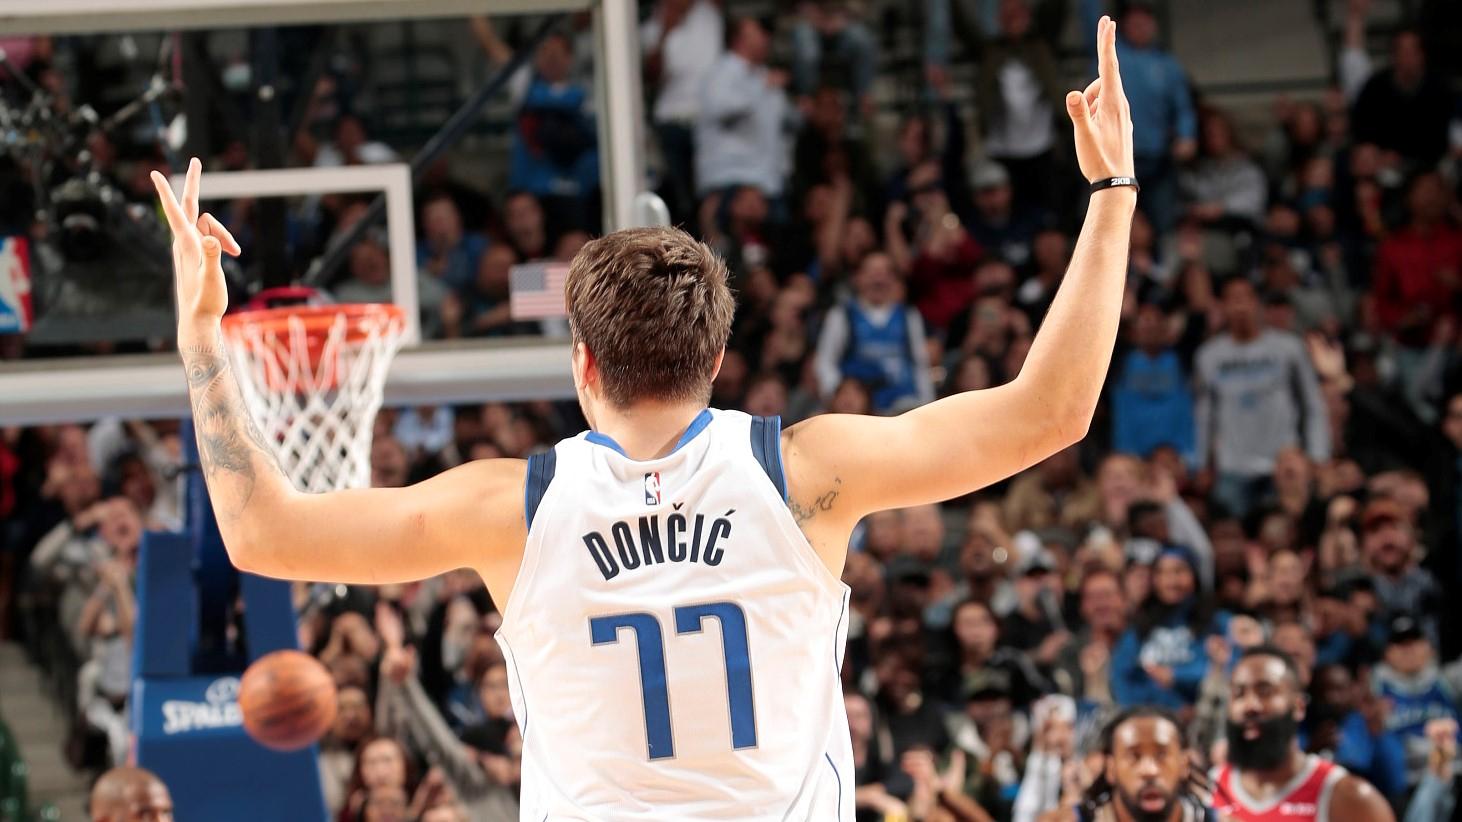 80e954e1f7e NBA highlights on Dec. 8  Luka Doncic makes hero for Mavericks. Copied